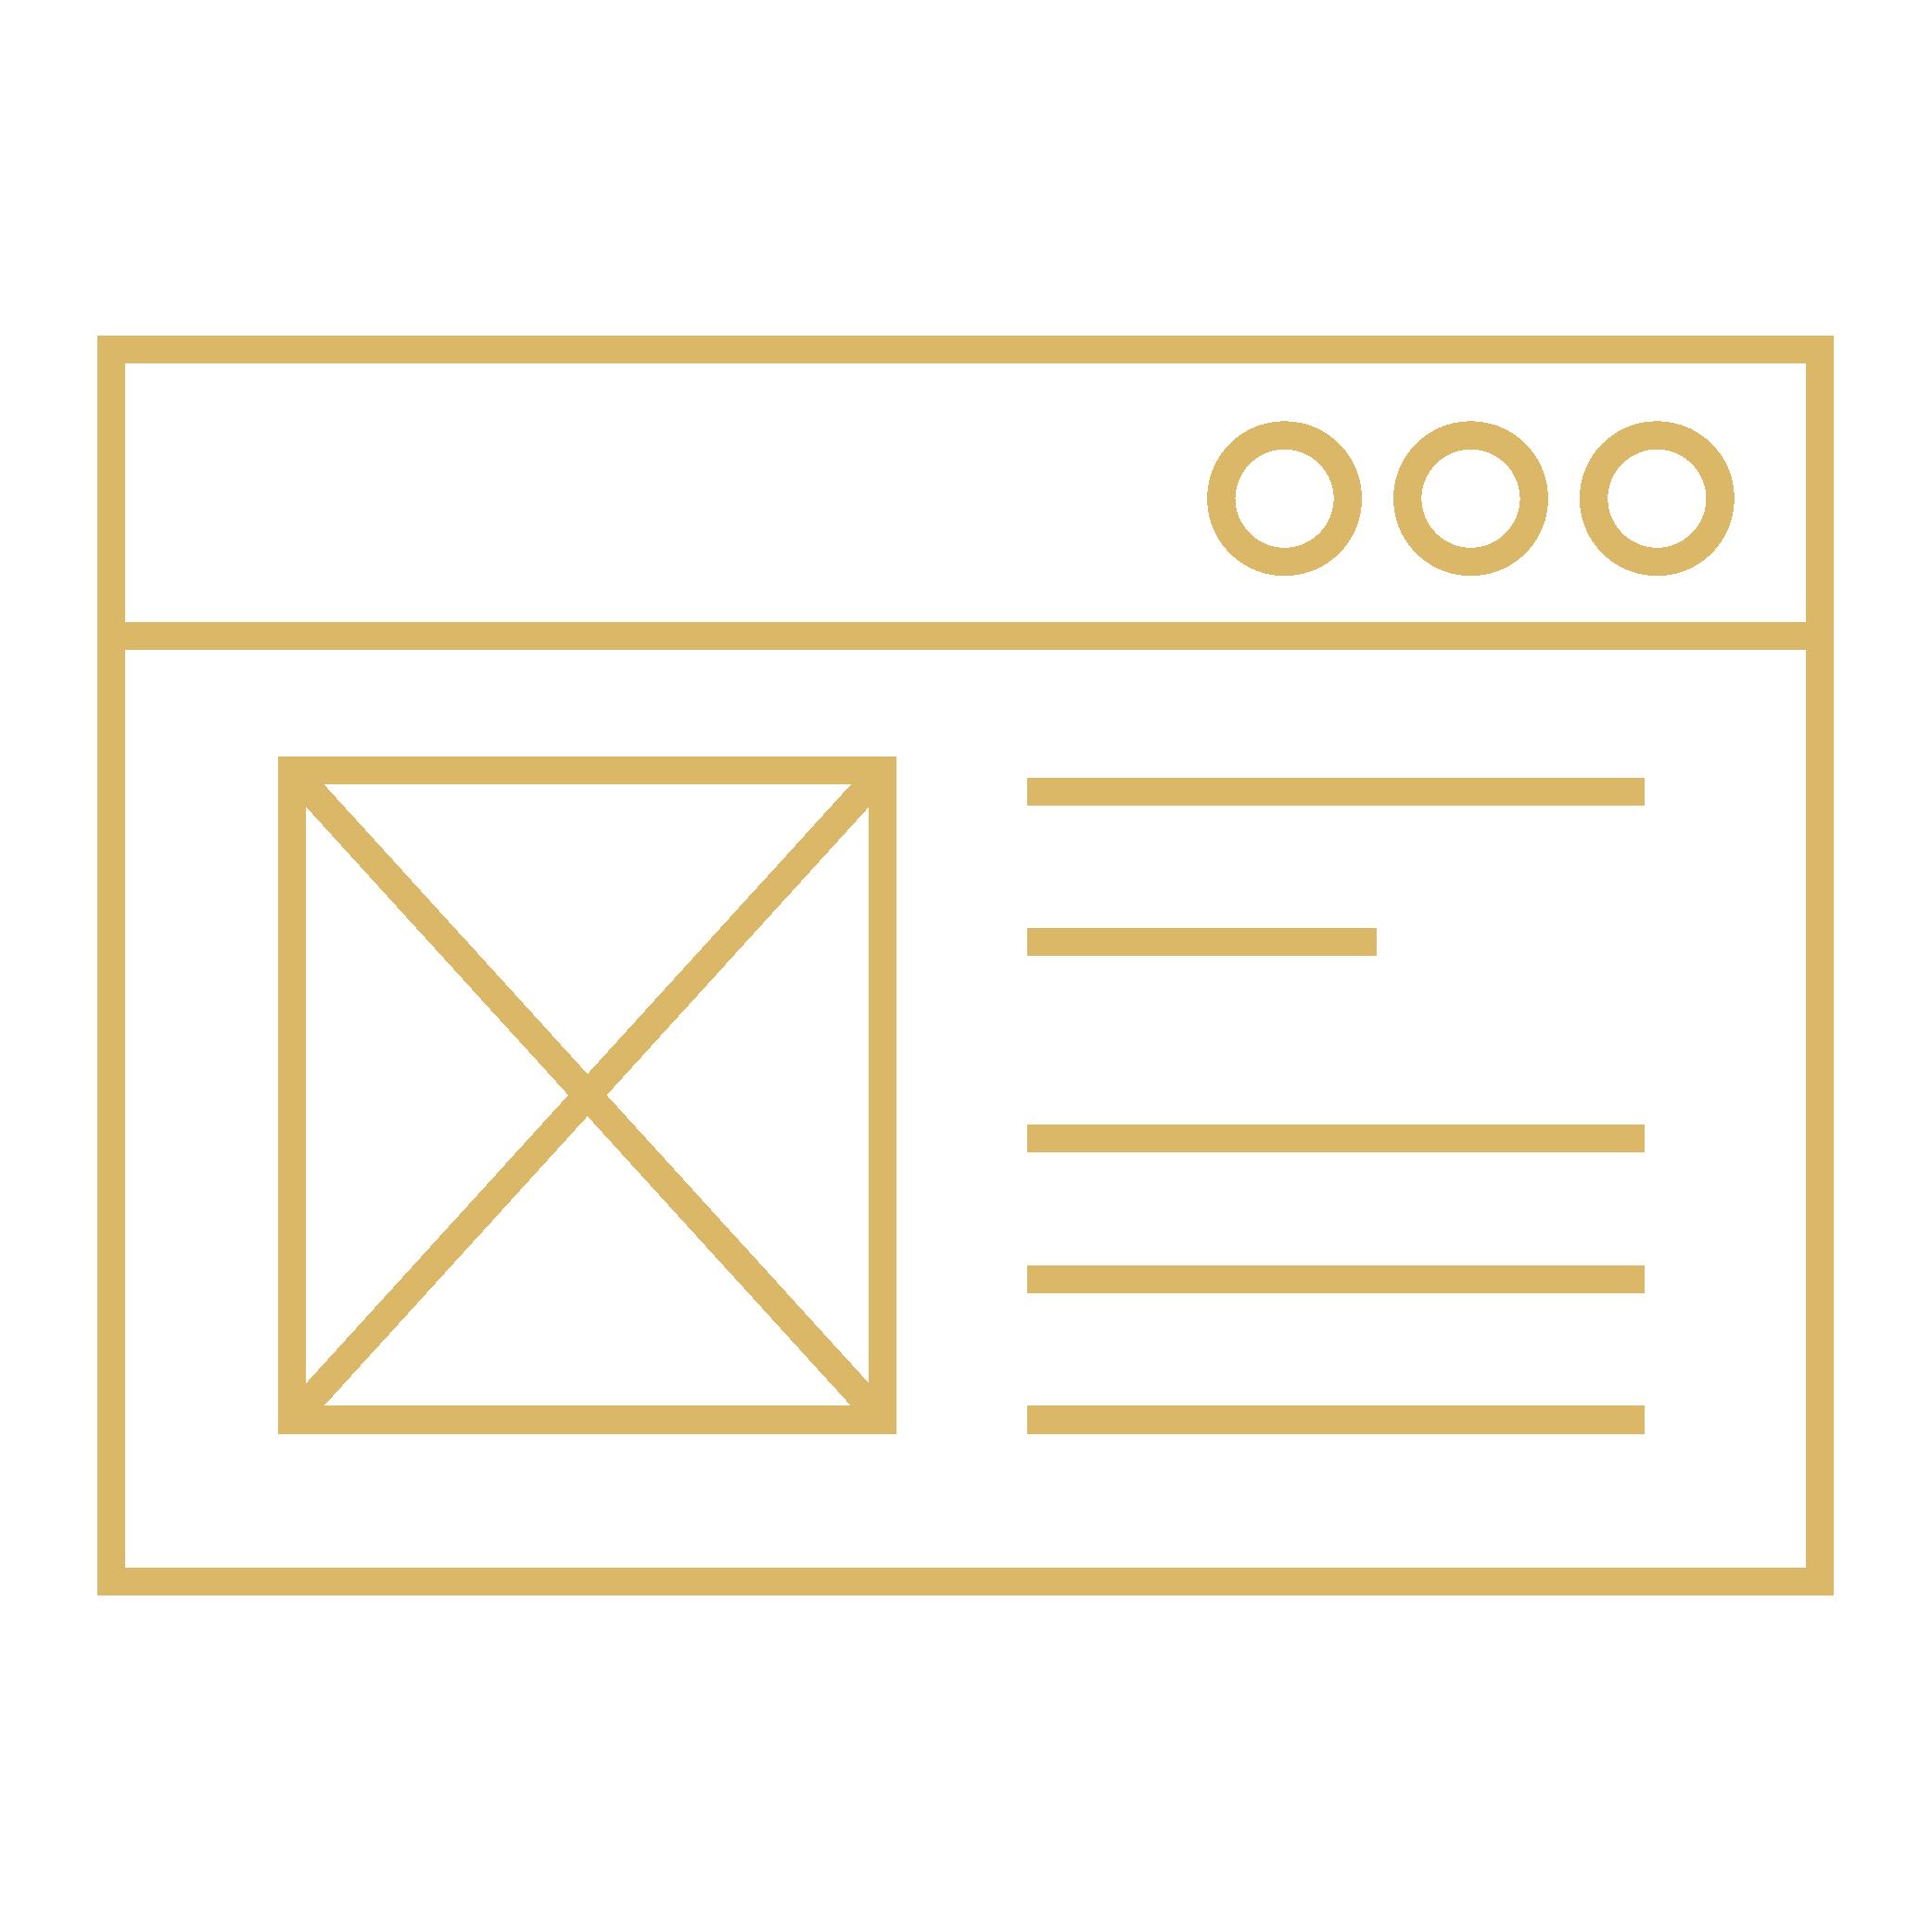 graphiste-cergy-95000-logo-site-internet-flyer-webdesigner-communication